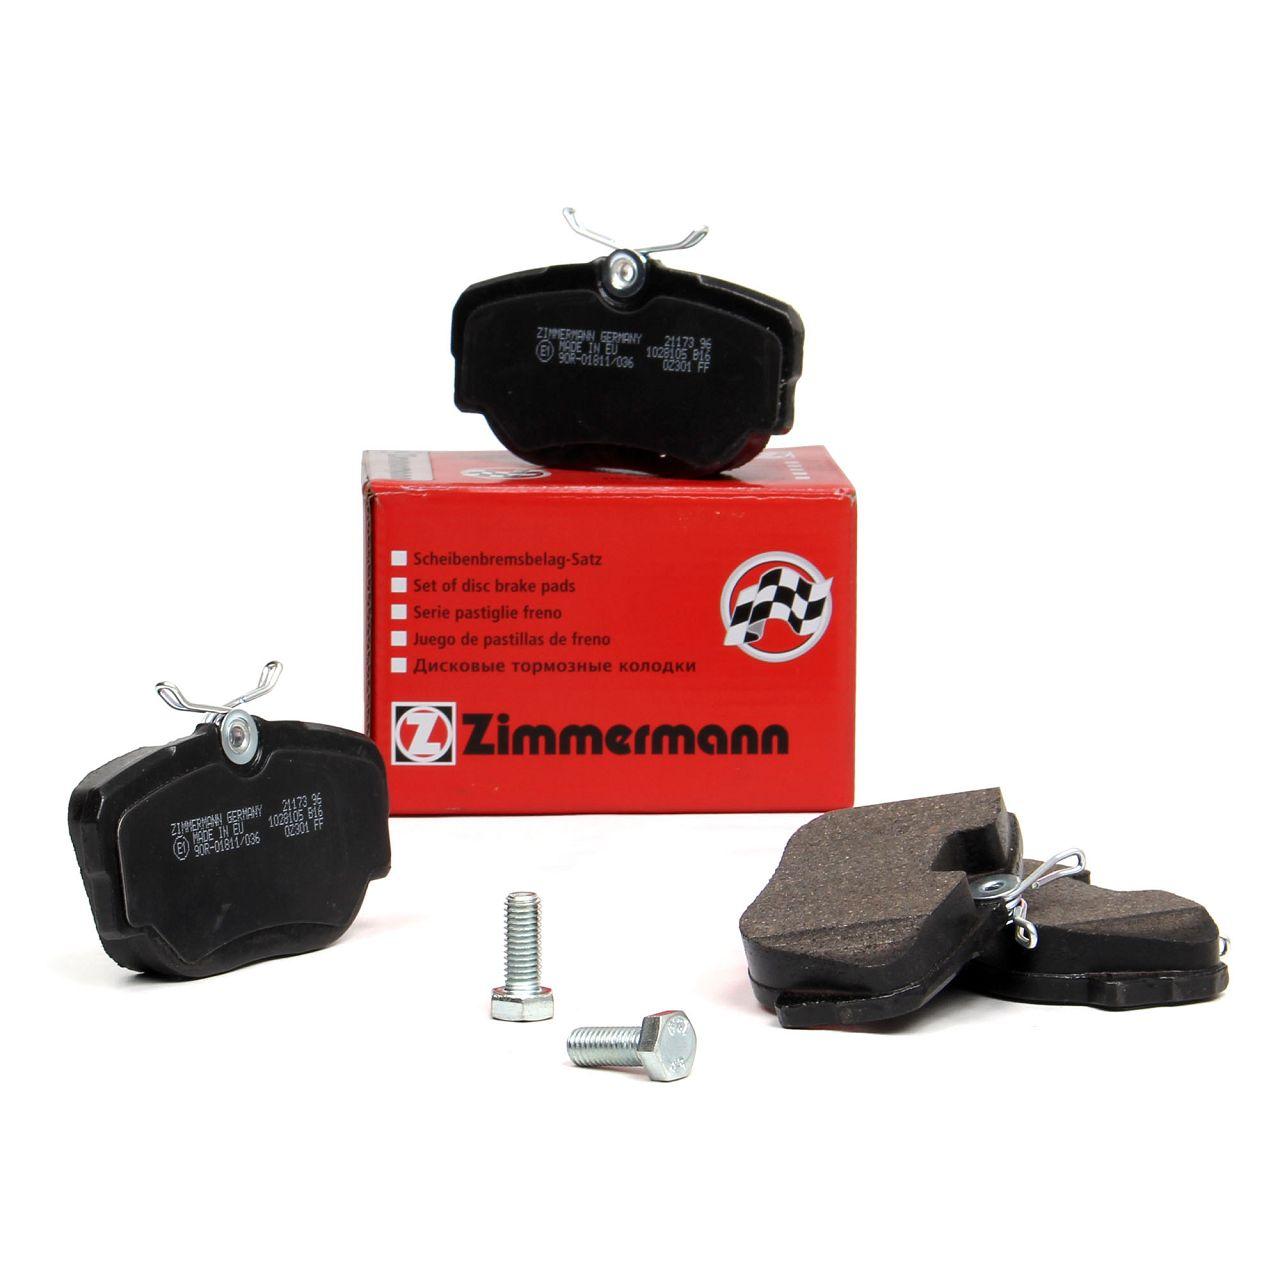 ZIMMERMANN Bremsbeläge Bremsklötze für BMW 3er E30 315-325 324d/td Z1 2.5 vorne